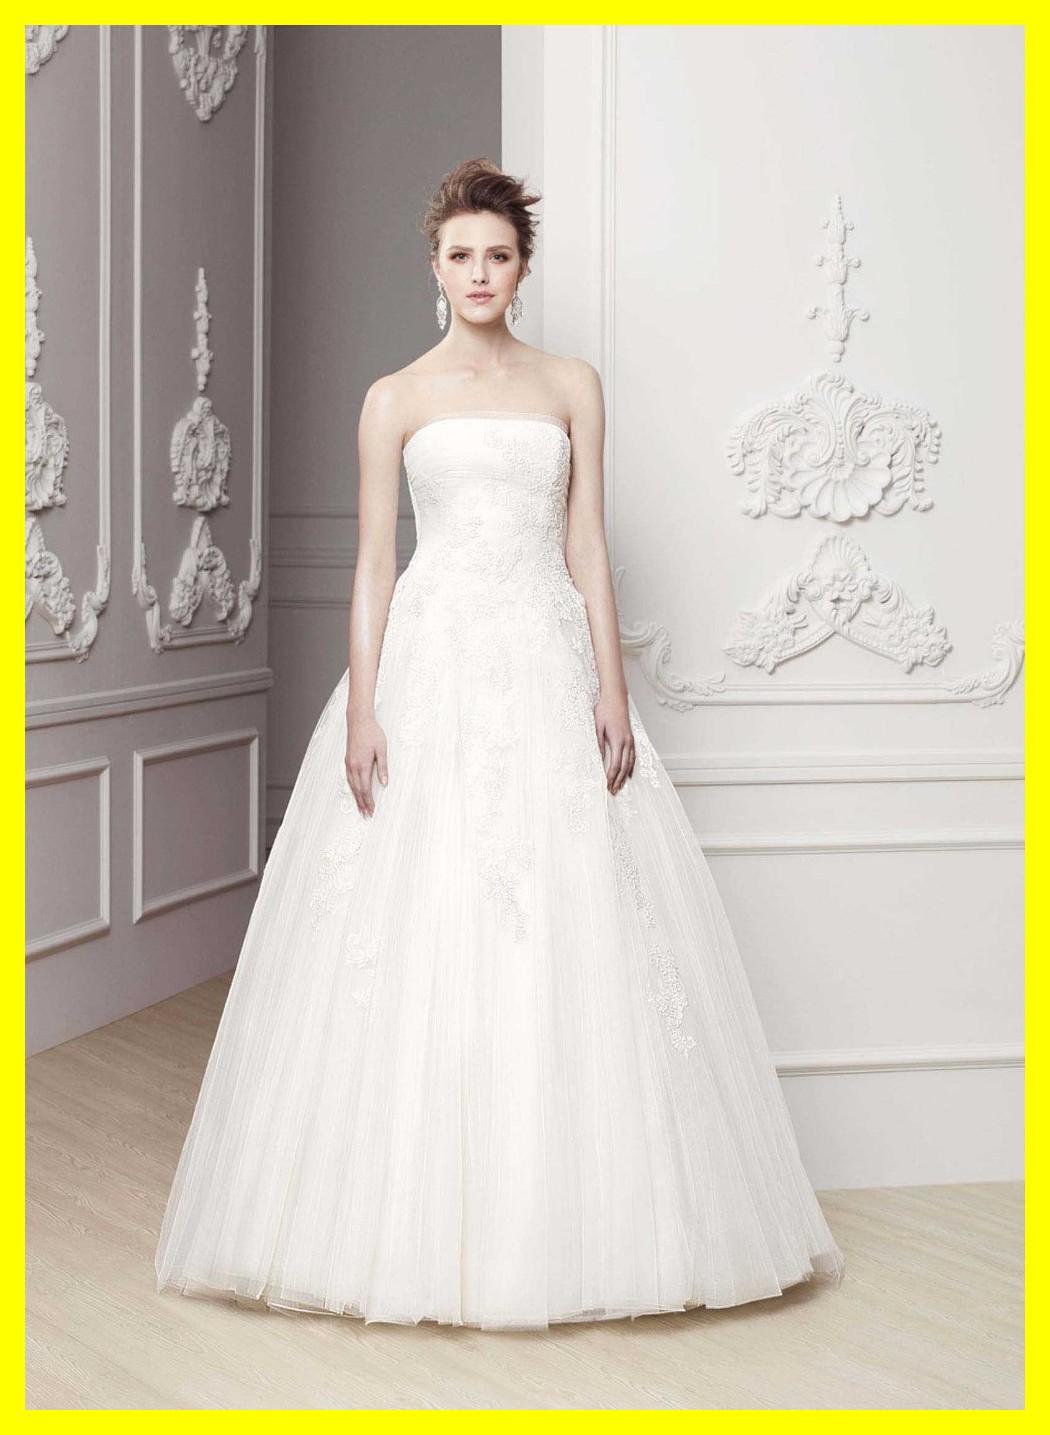 rent designer wedding dress borrow wedding dress wedding dresses to rent uk 48